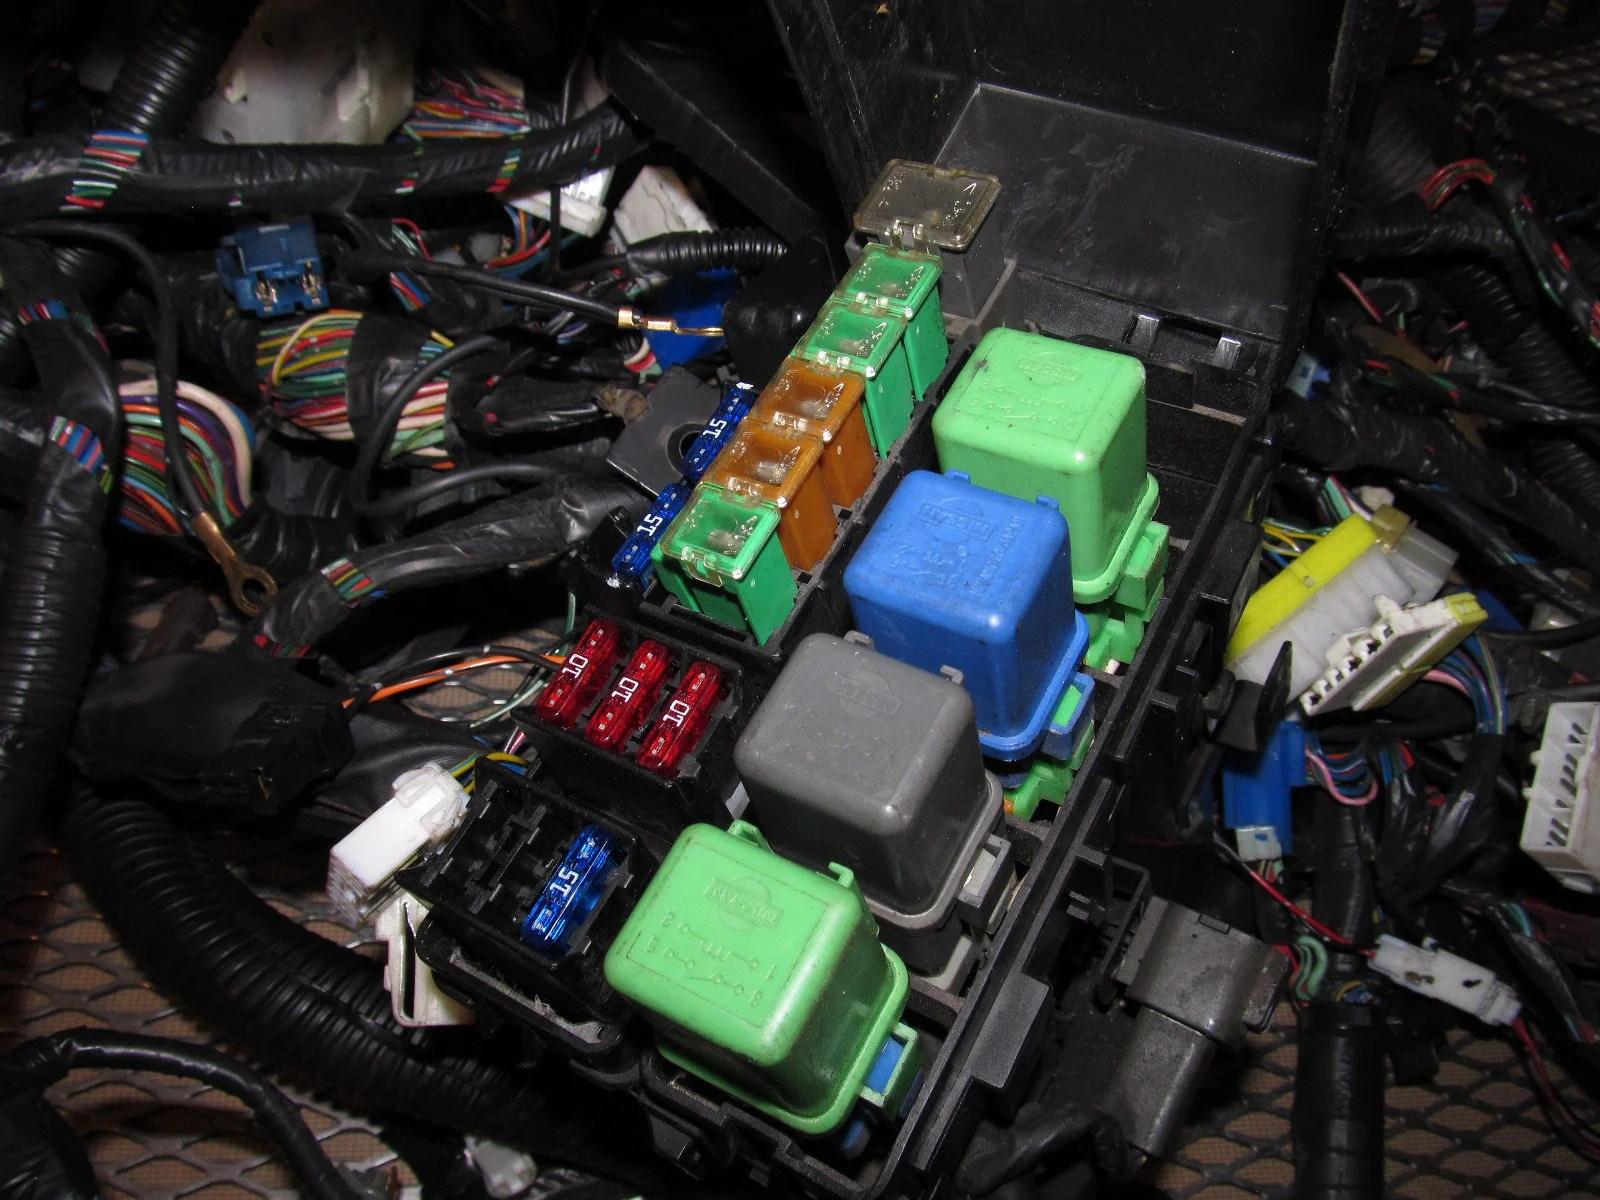 medium resolution of 240sx battery fuse box wiring diagram ebook240sx battery fuse box